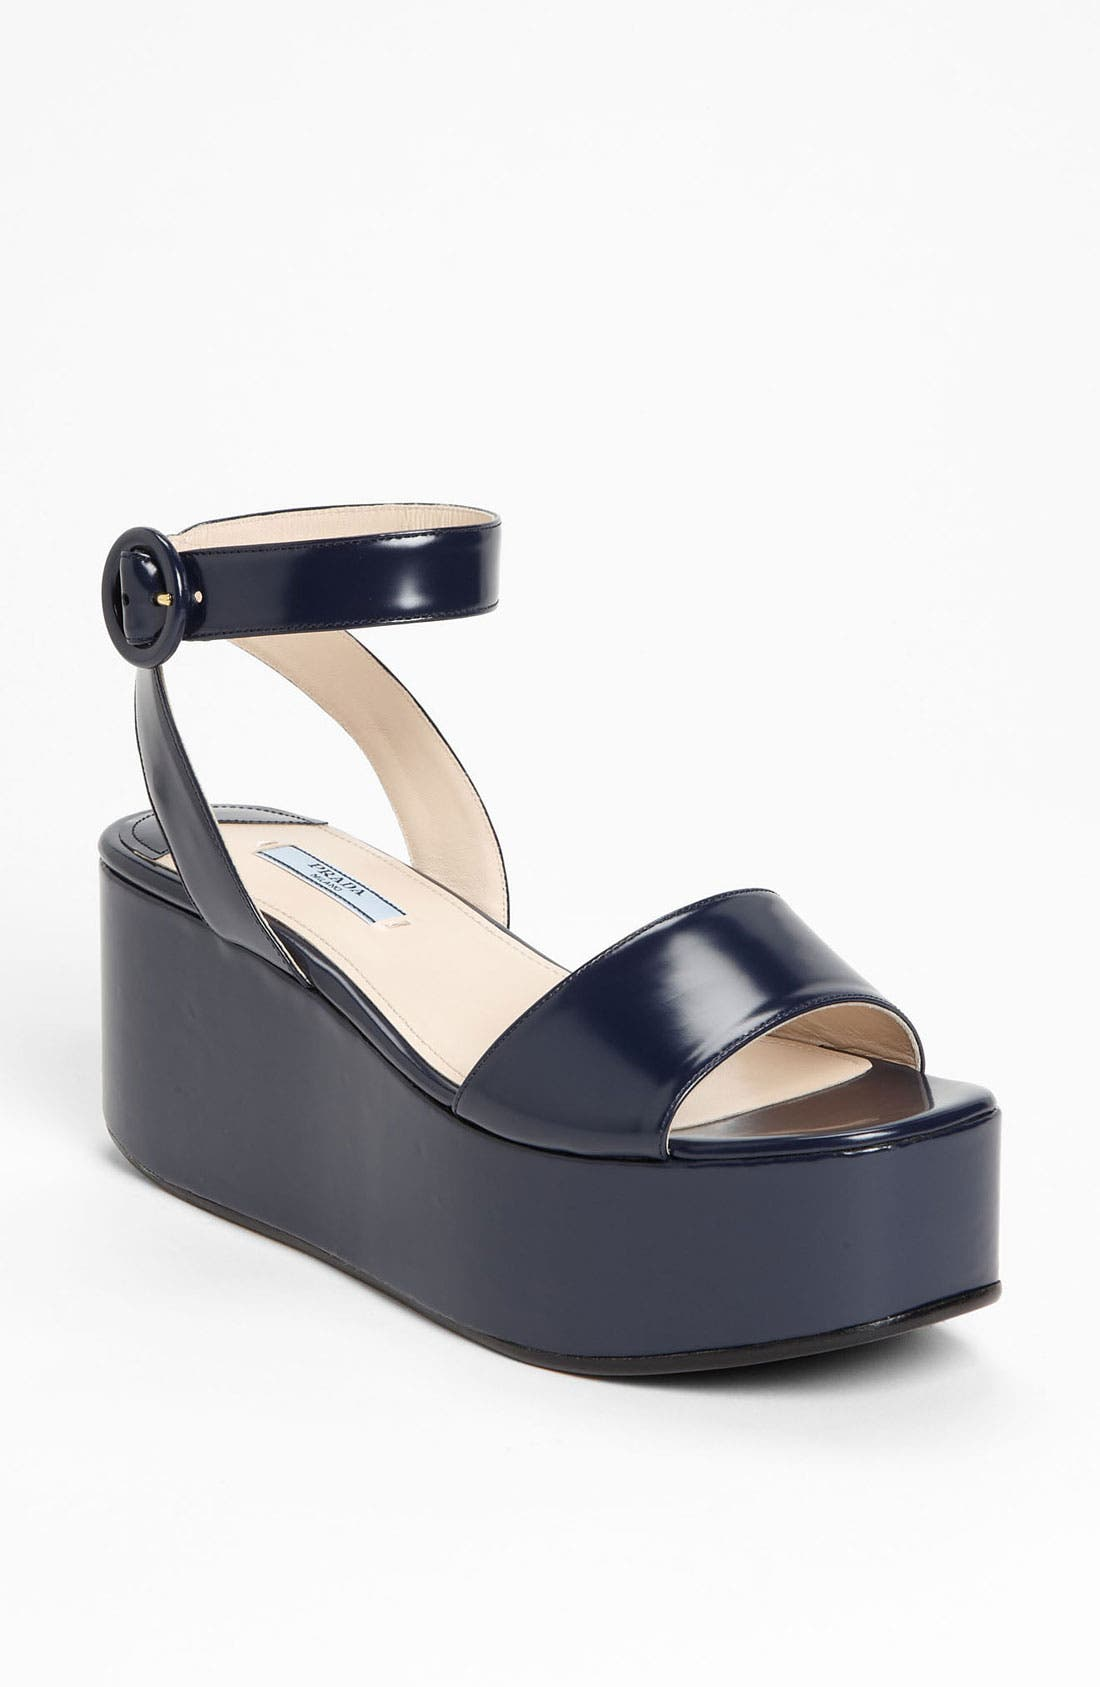 Alternate Image 1 Selected - Prada Ankle Strap Wedge Sandal